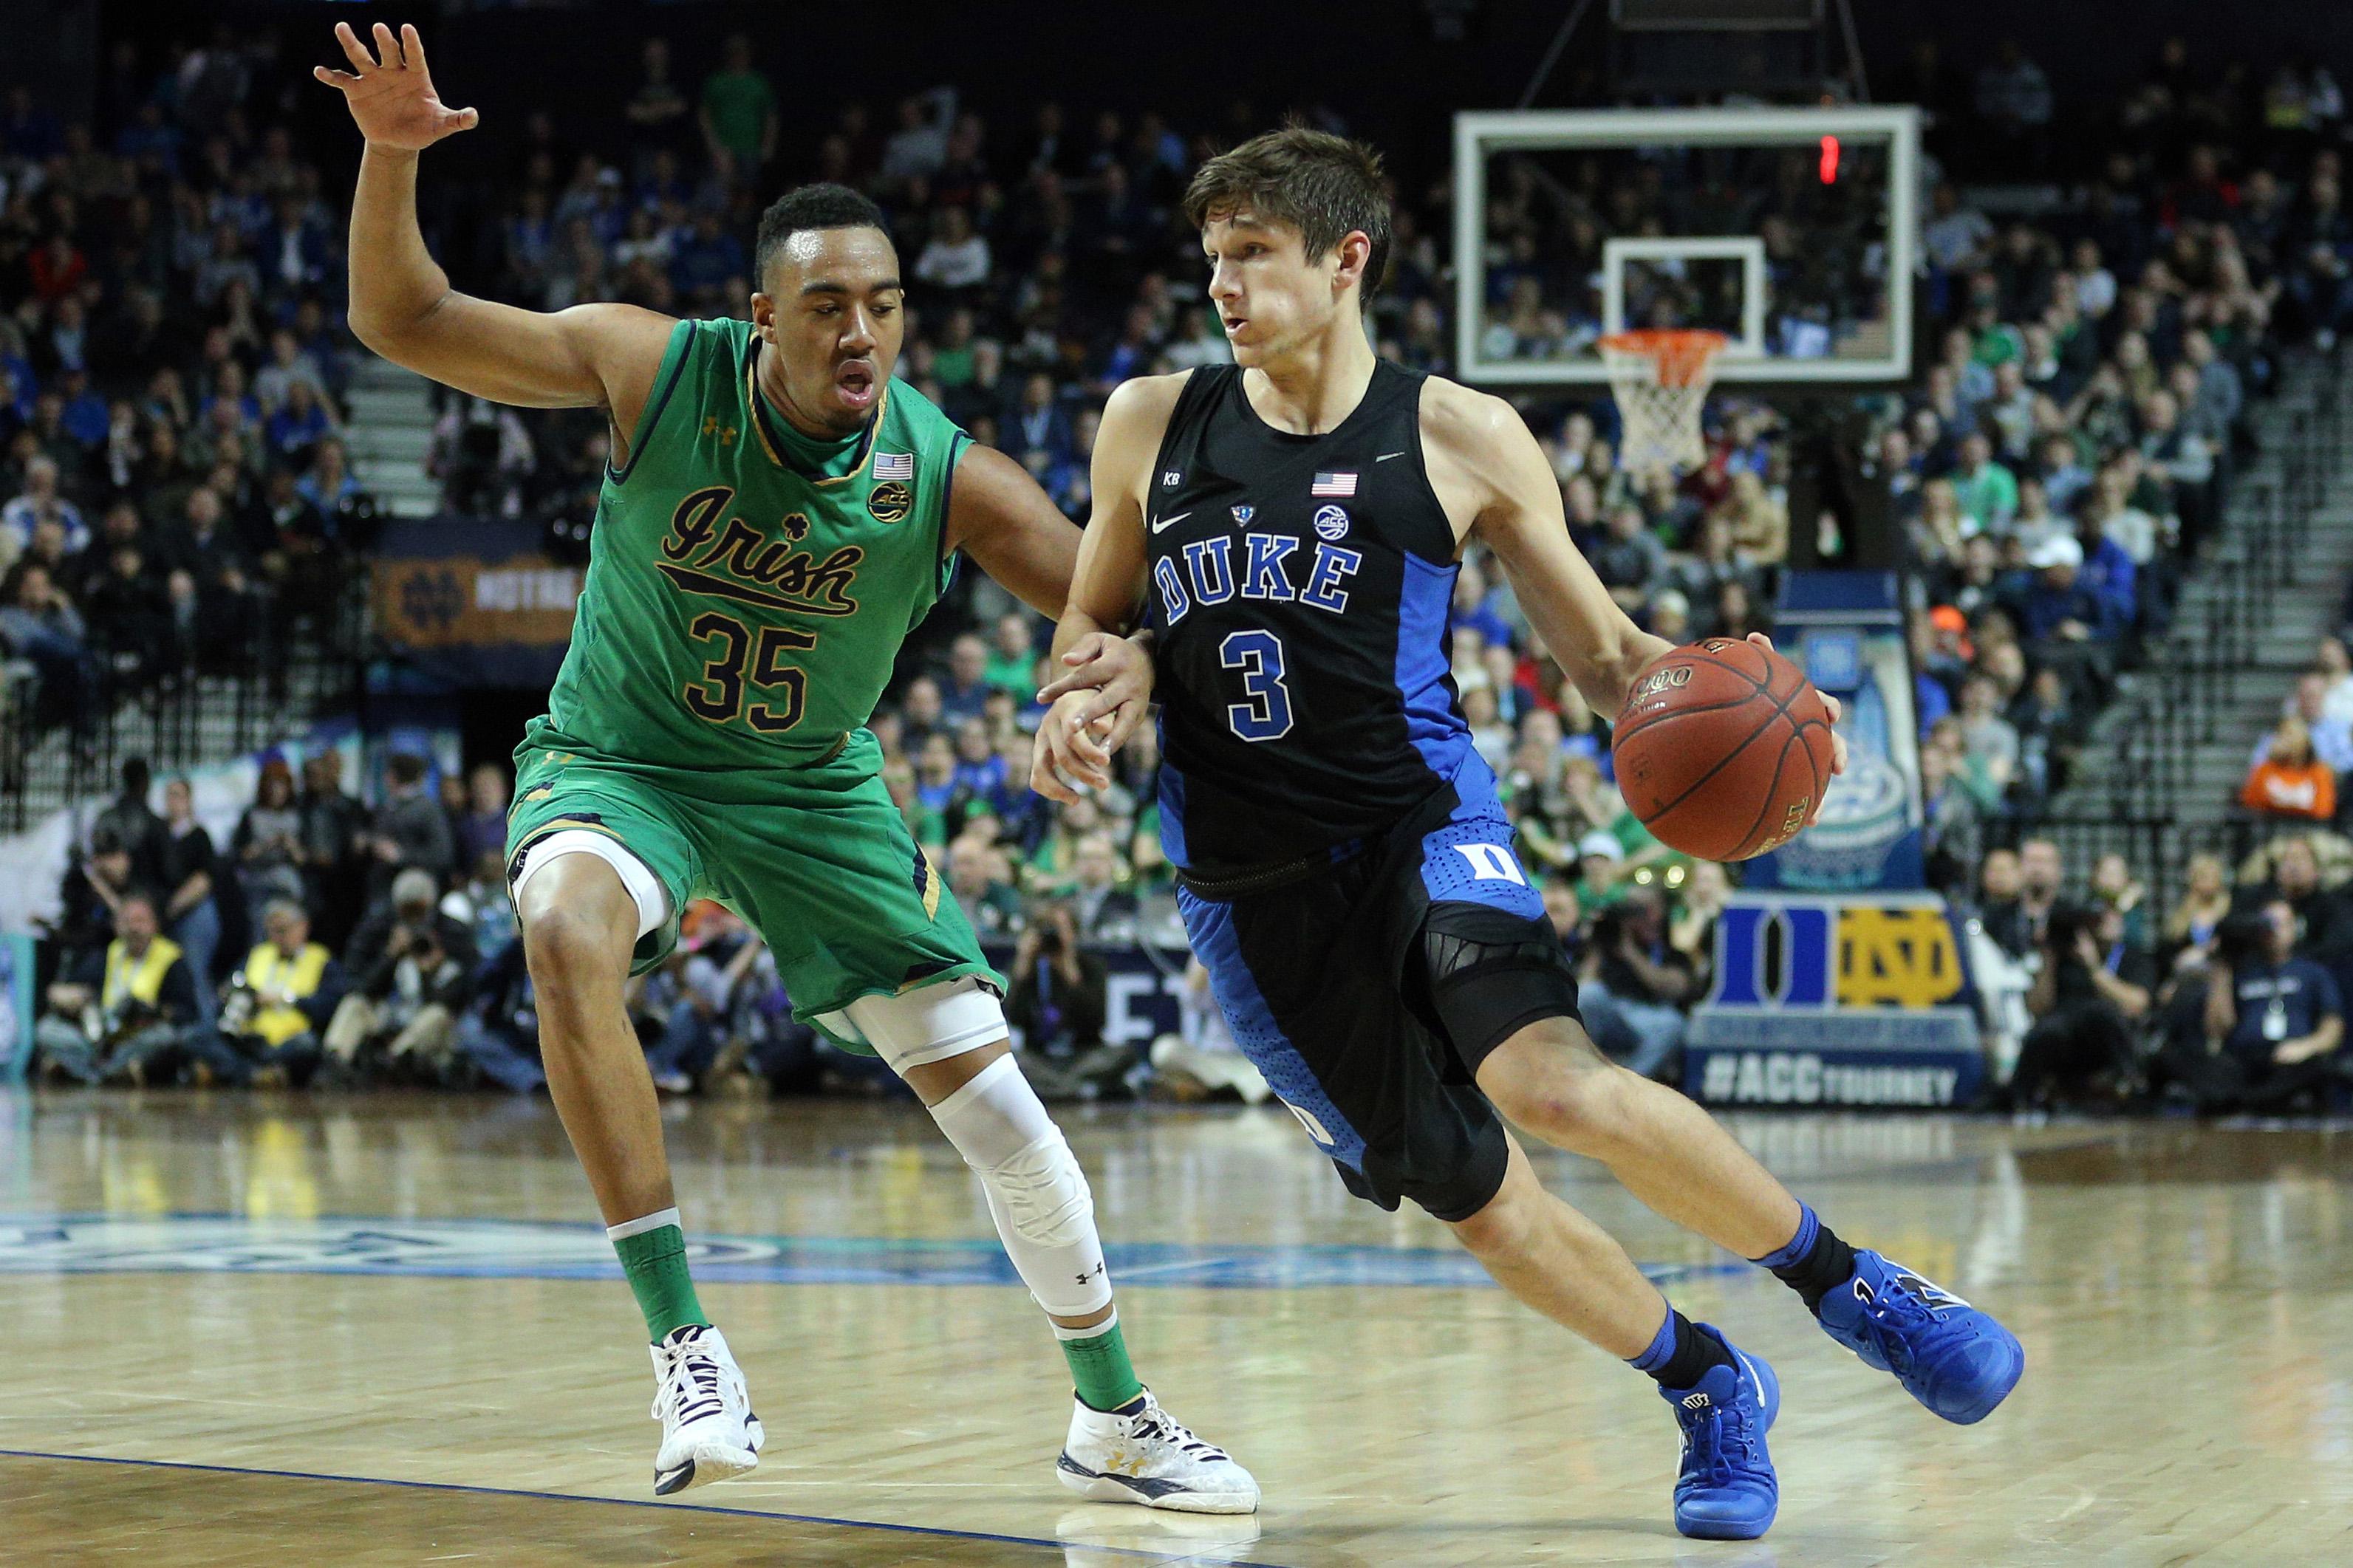 9935695-ncaa-basketball-acc-conference-tournament-final-notre-dame-vs-duke